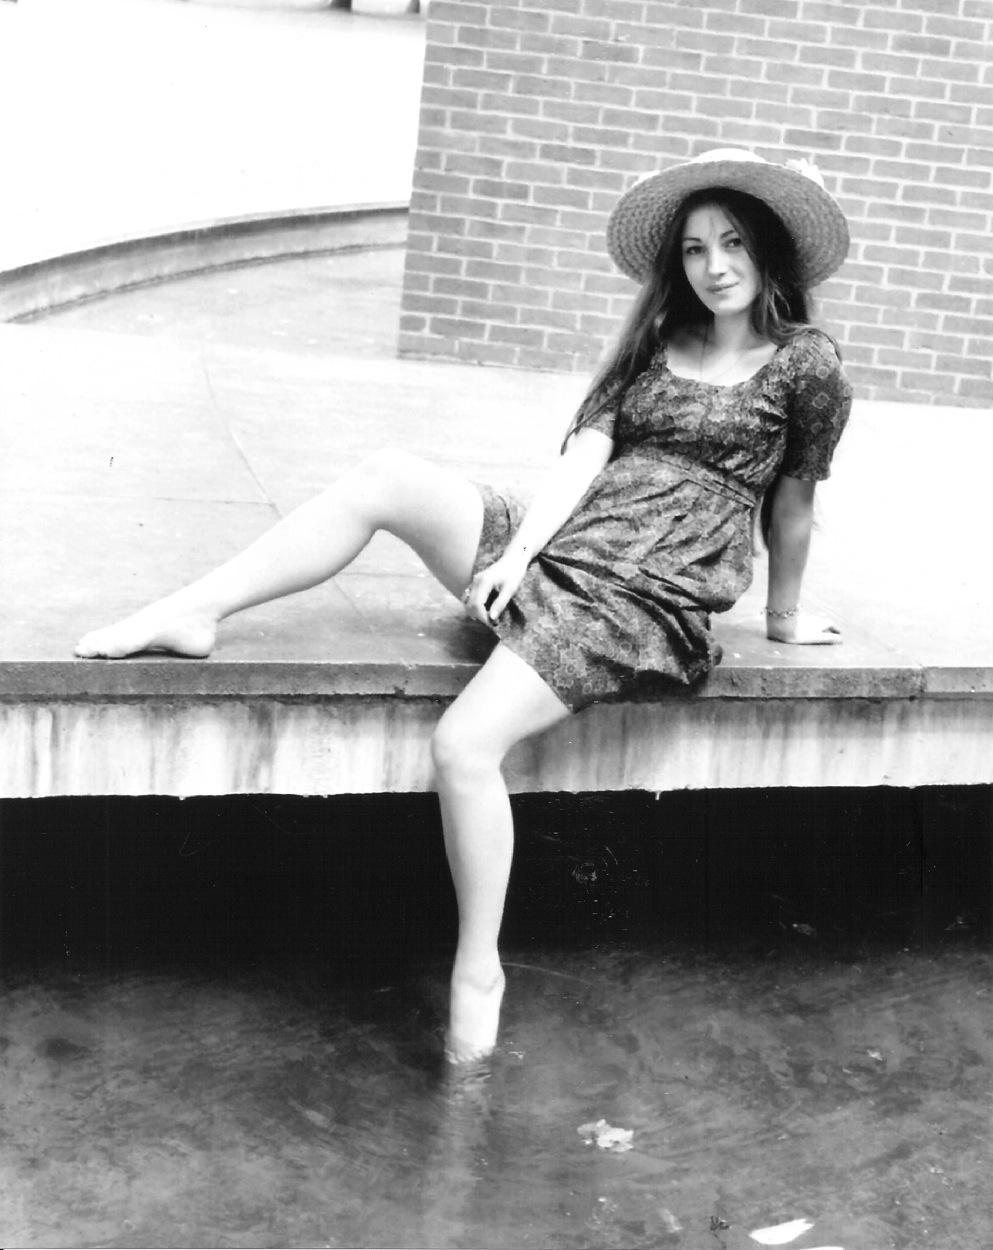 Jane Seymour Getting Her Toes Wet Blueiskewl